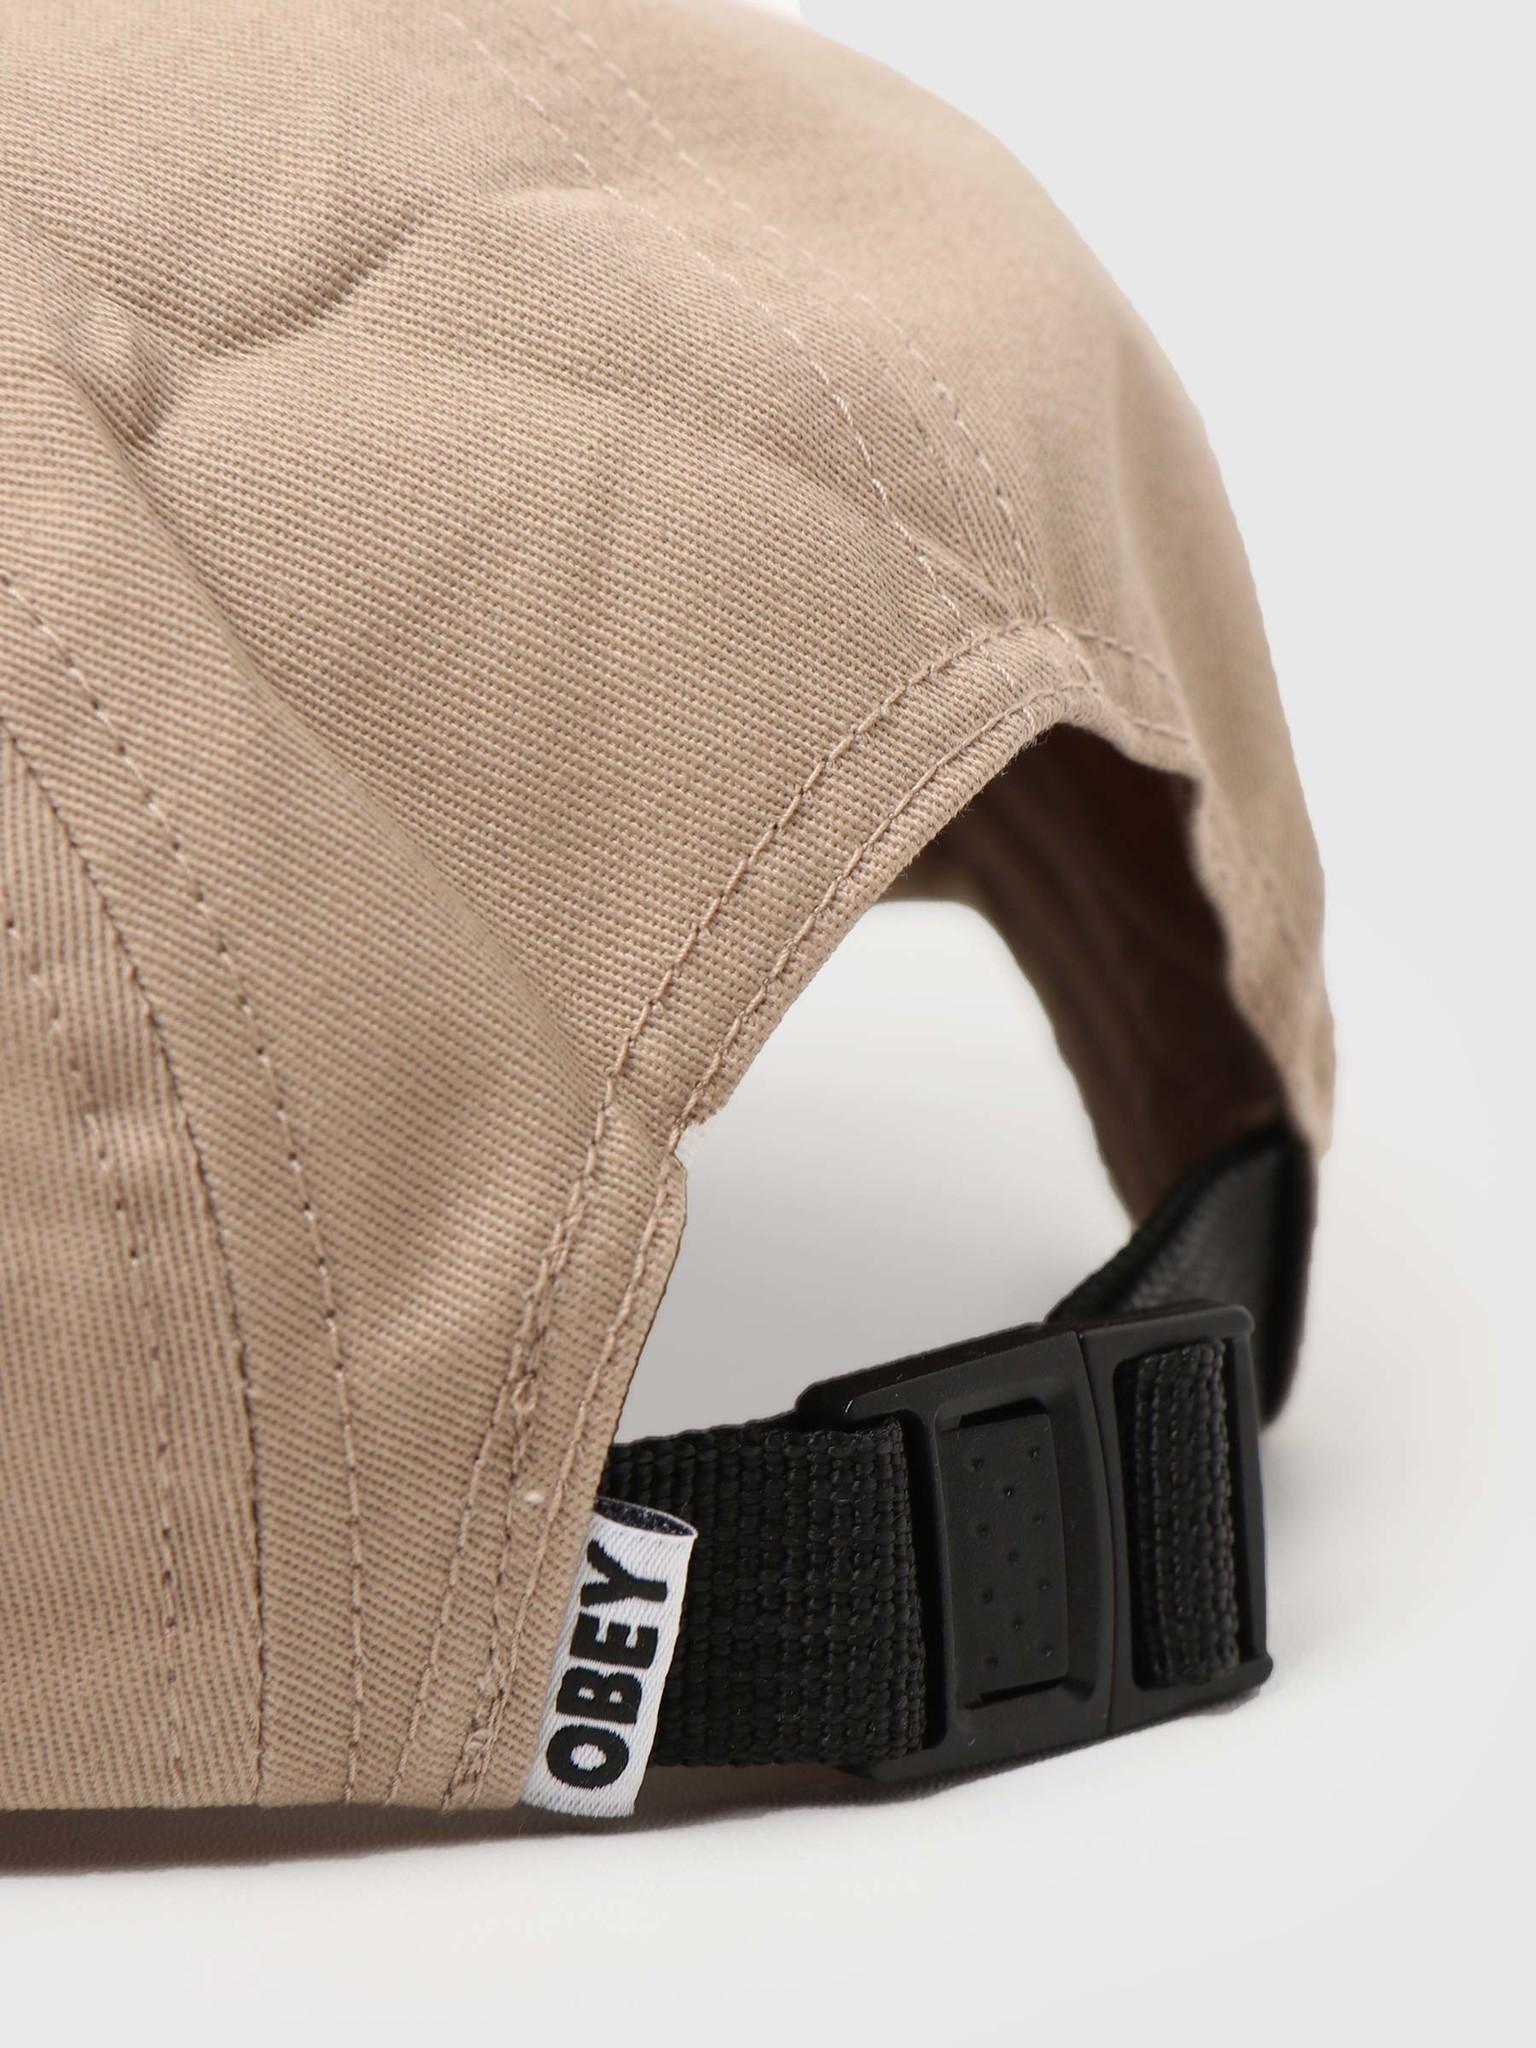 Obey Obey Eyes 5 Panel Hat Khaki 100490059-KHA